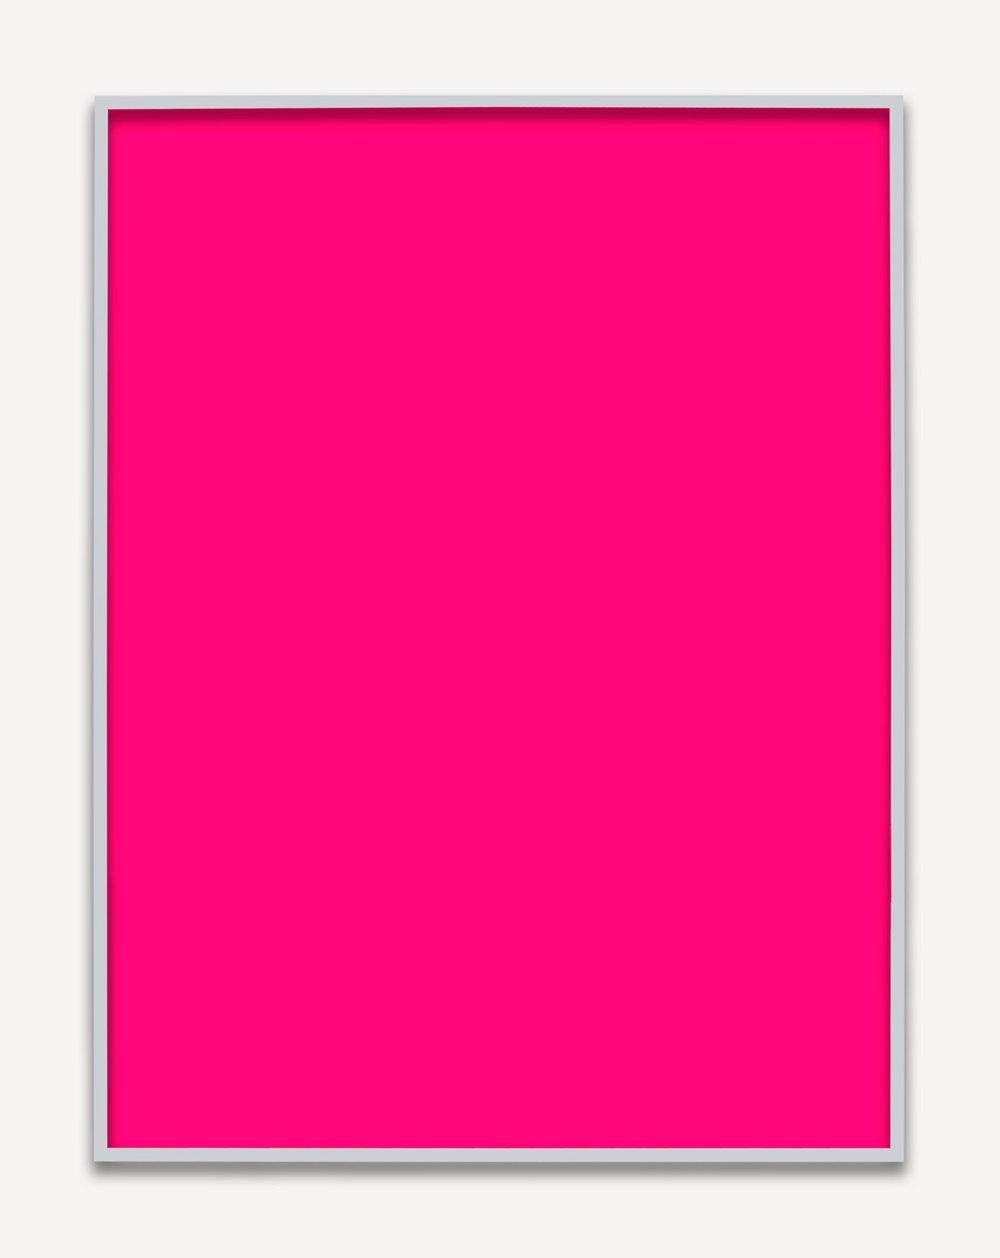 Phil Chang, Untitled (Magenta Monochrome), 2016 chromogenic print 152,5 x 122 cm - 60 x 48 inches